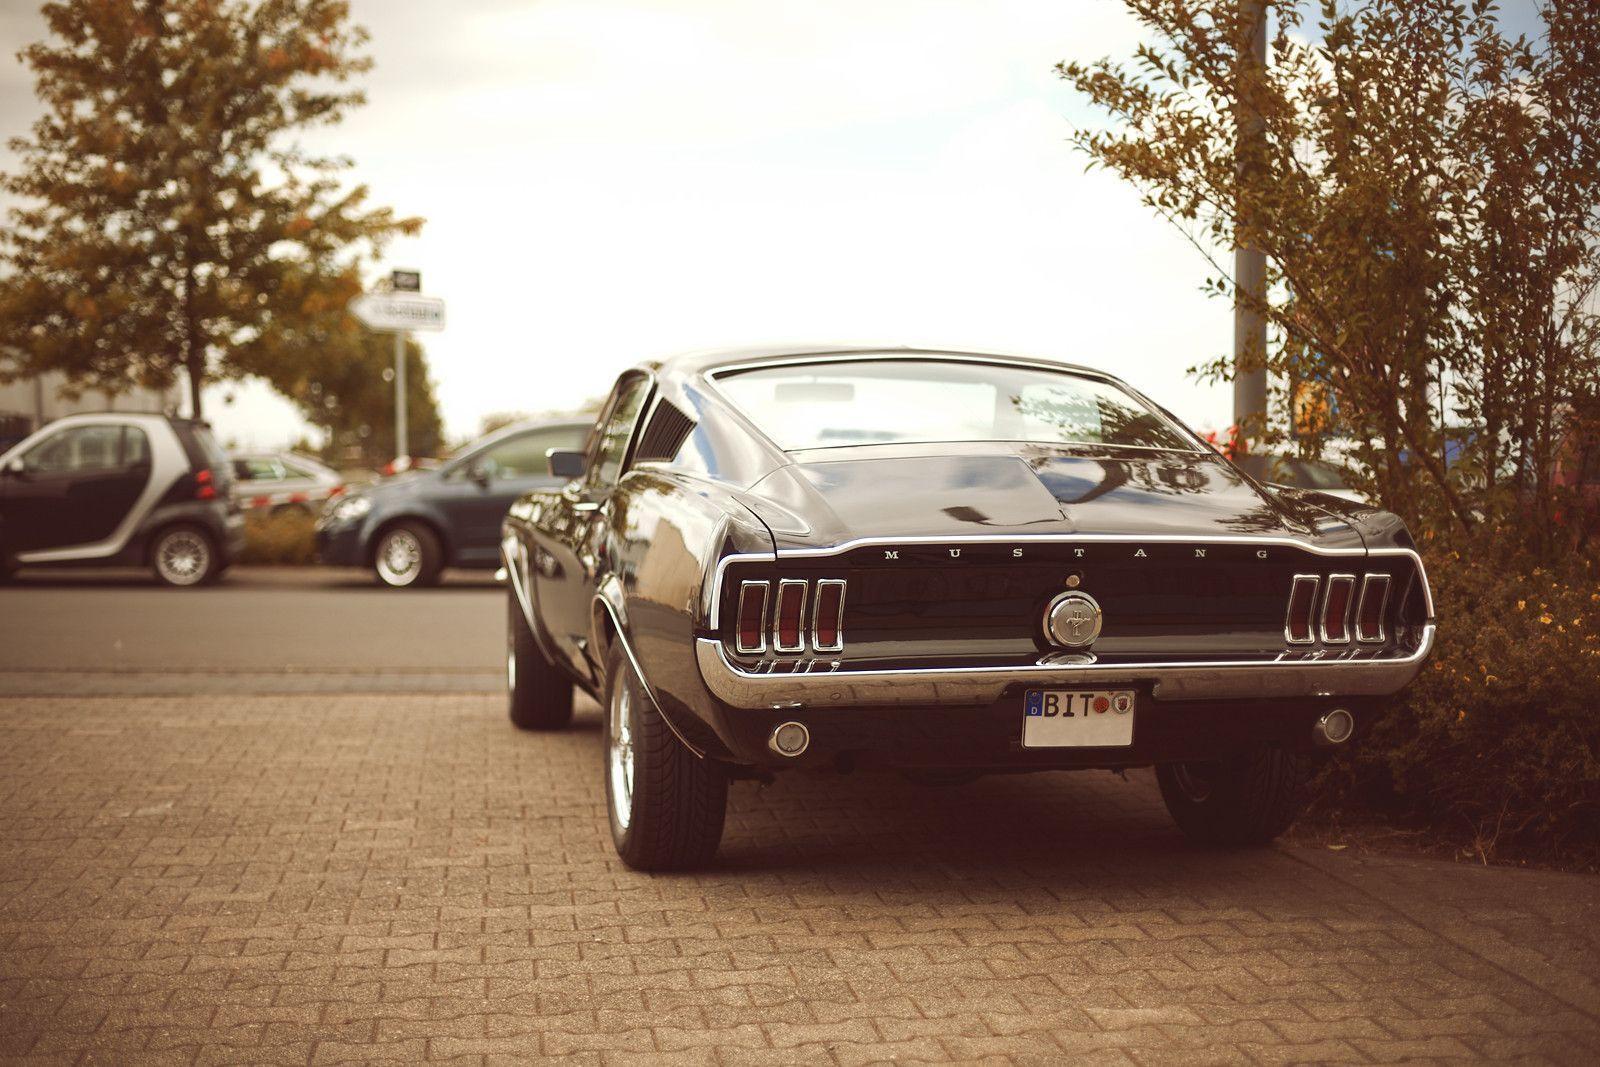 1967 Mustang Wallpapers 1600x1067